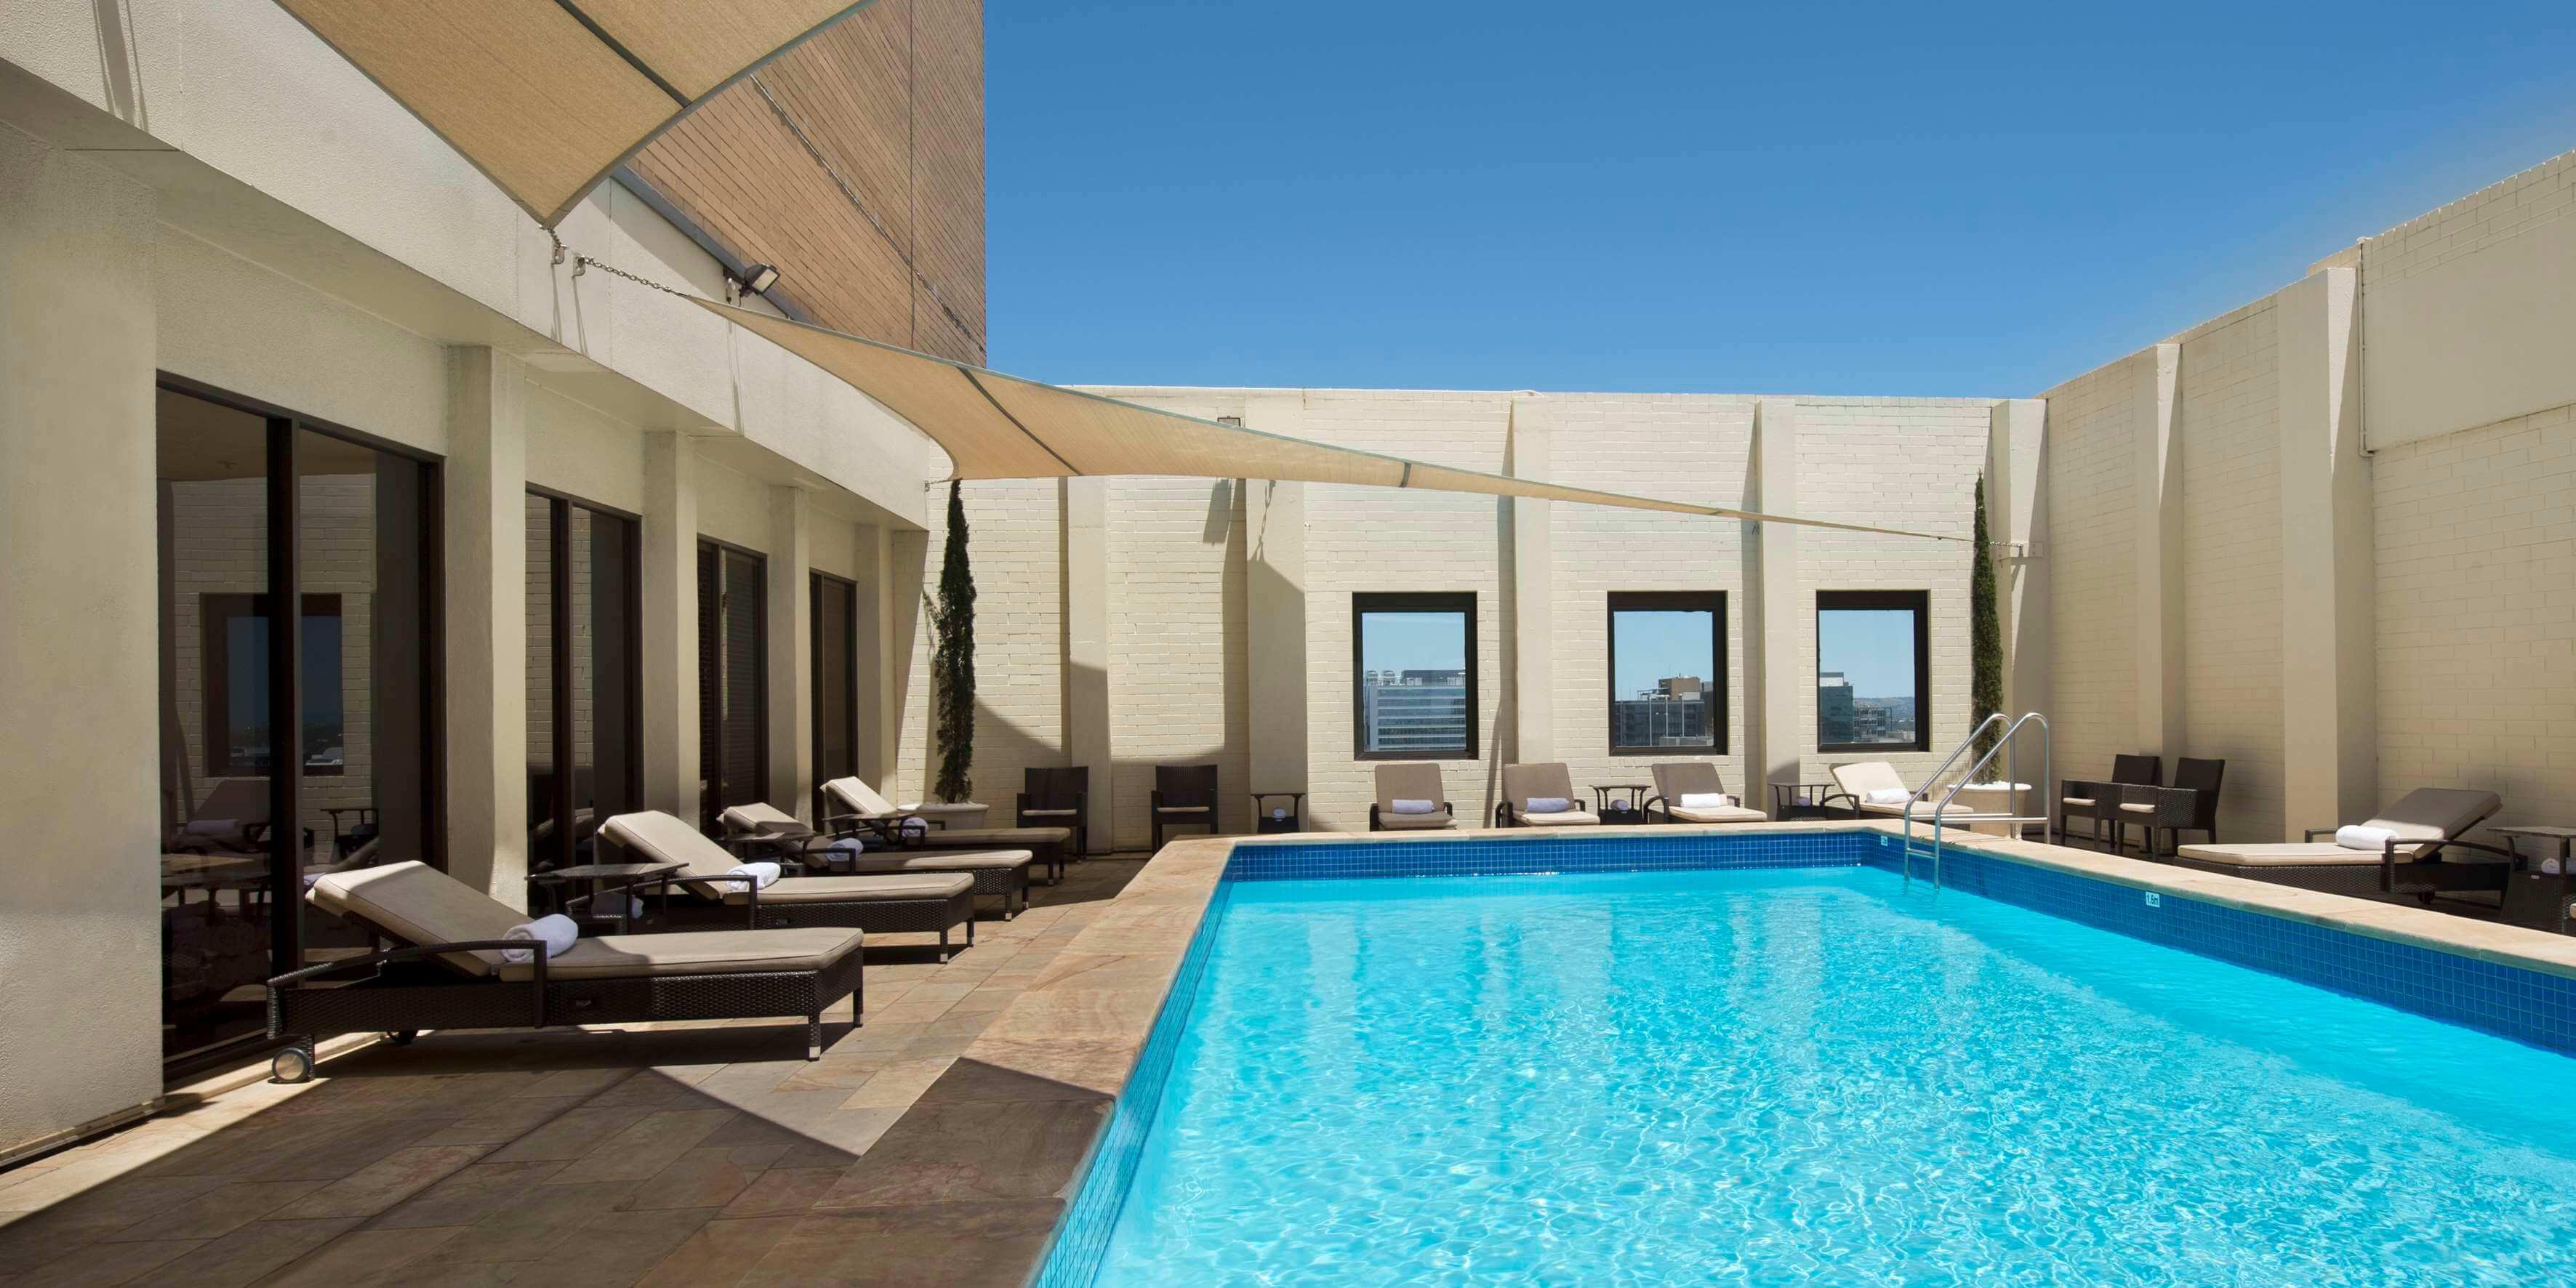 Stamford Plaza Adelaide pool